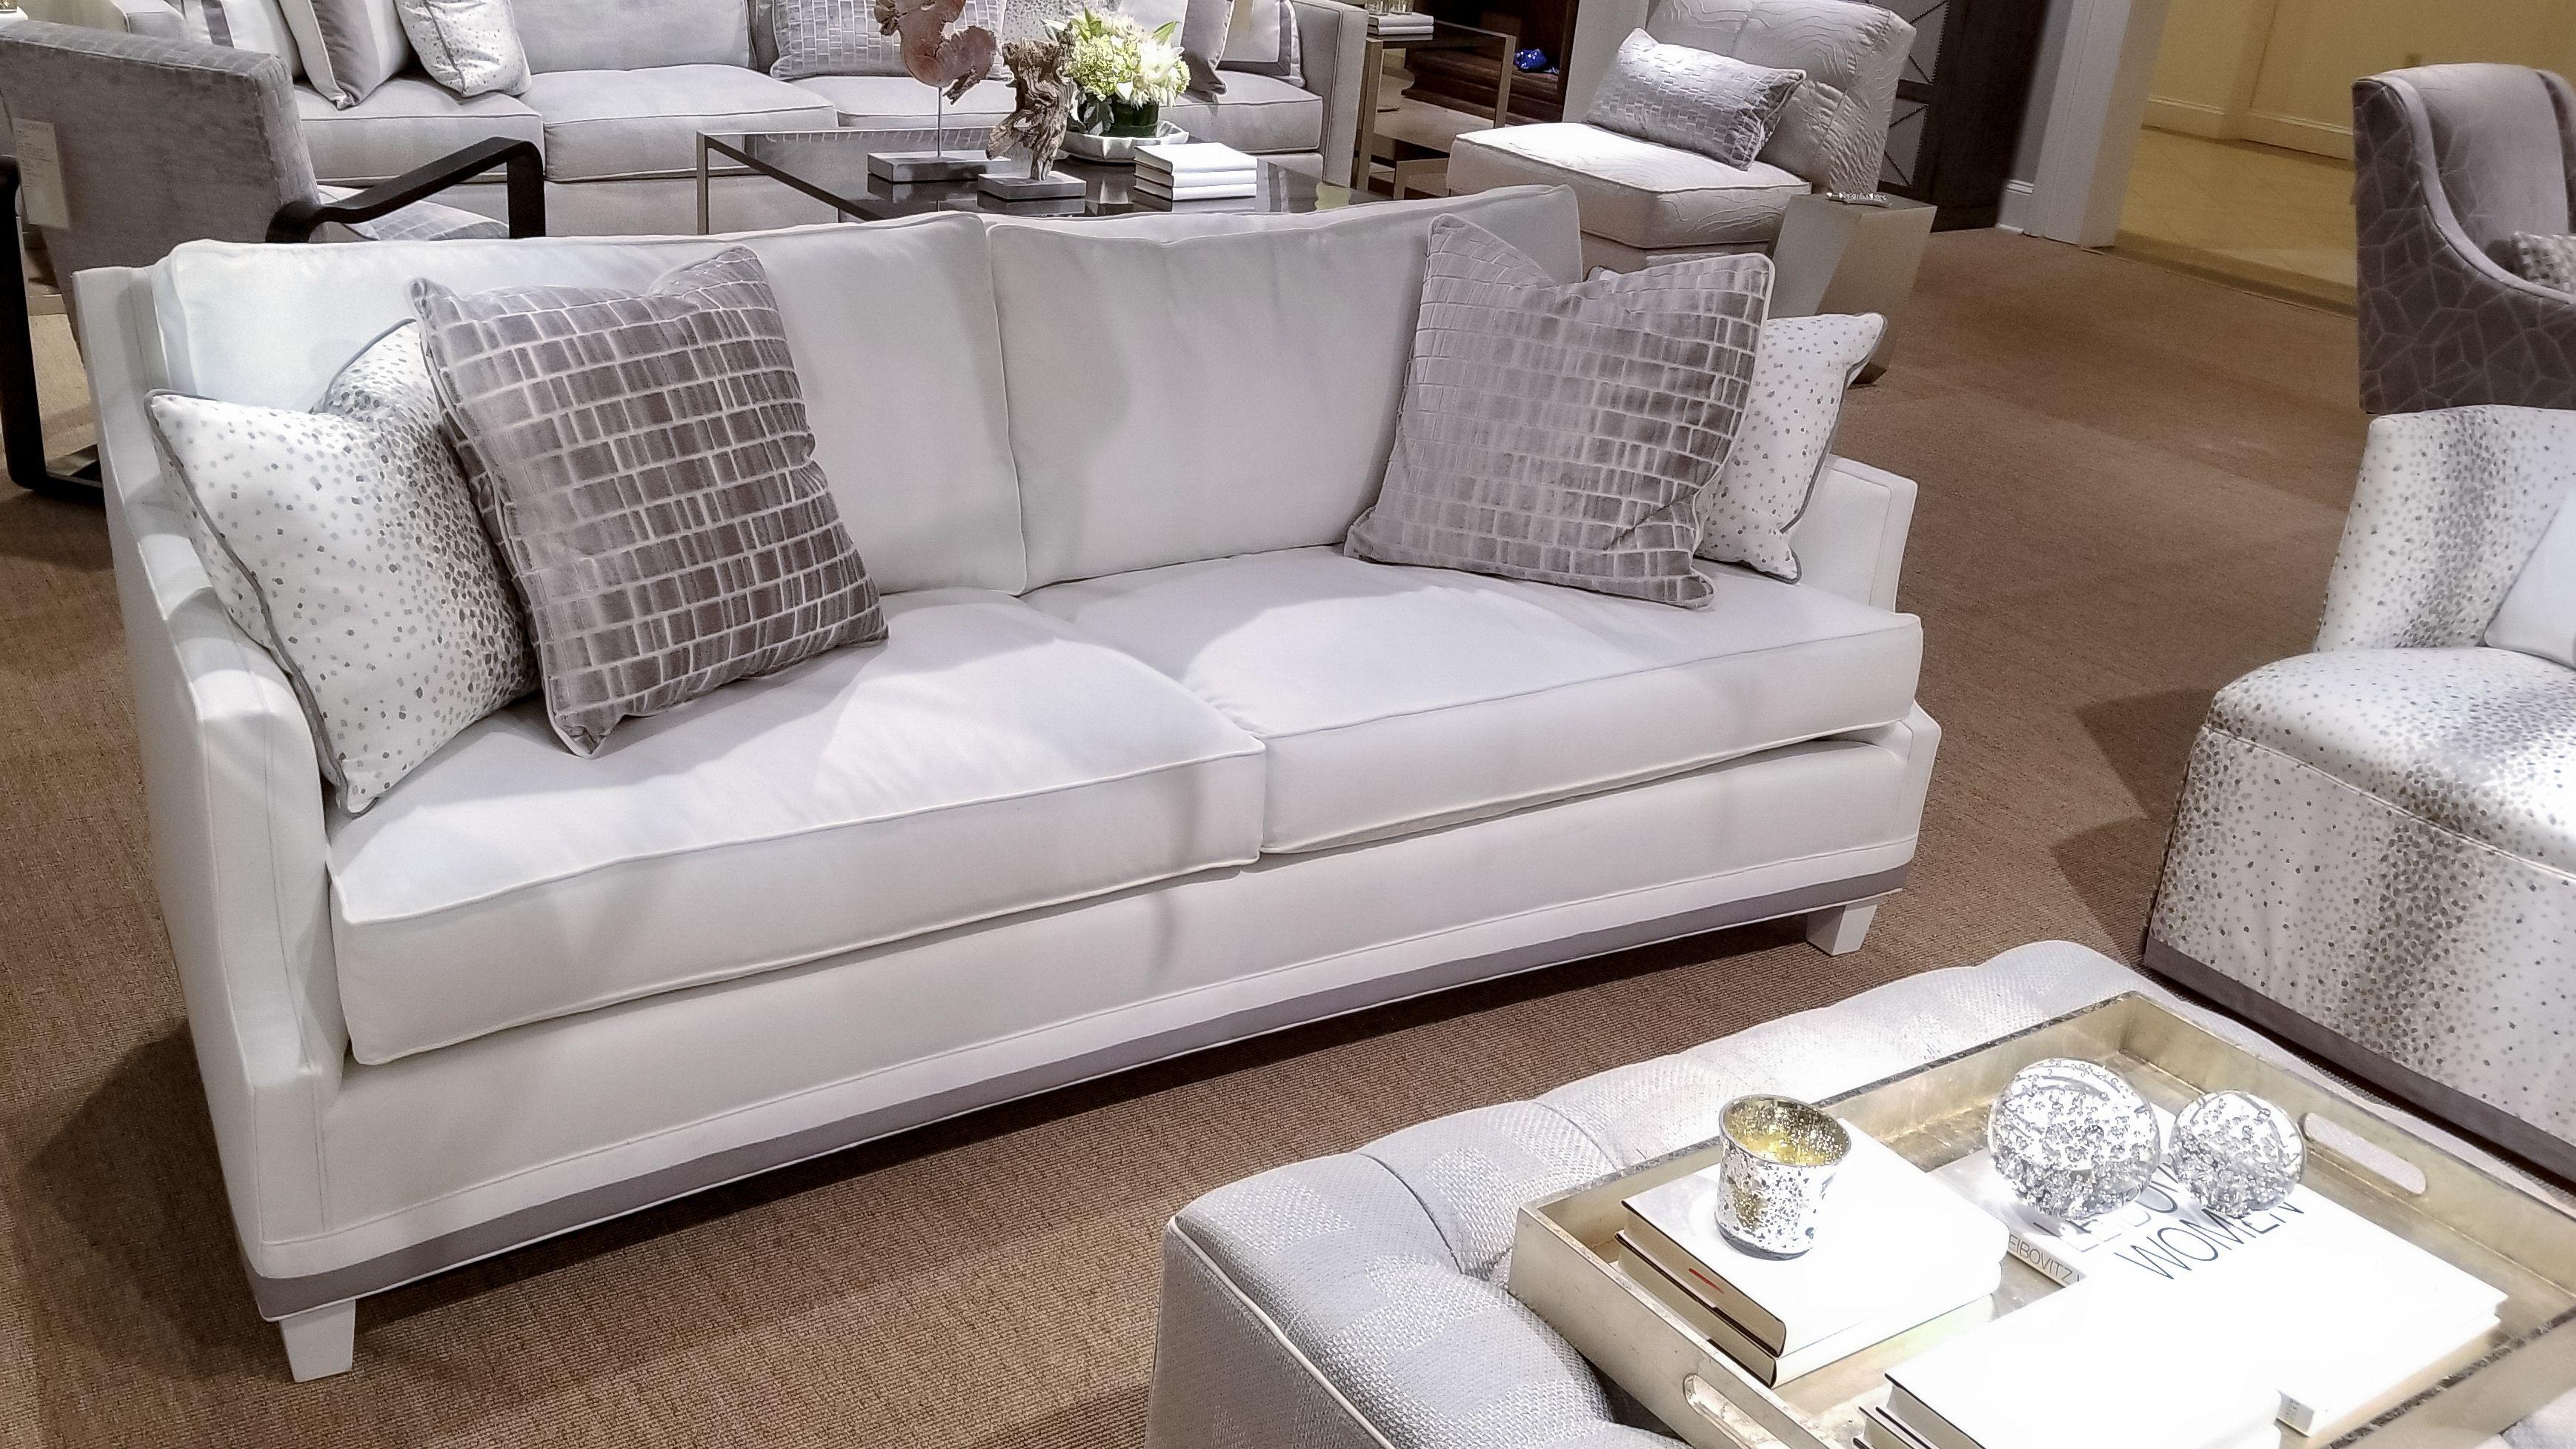 Essence Swivel Chair U1234 1 Fabric F6142 Parc Factory  # Muebles Zb Zaragoza